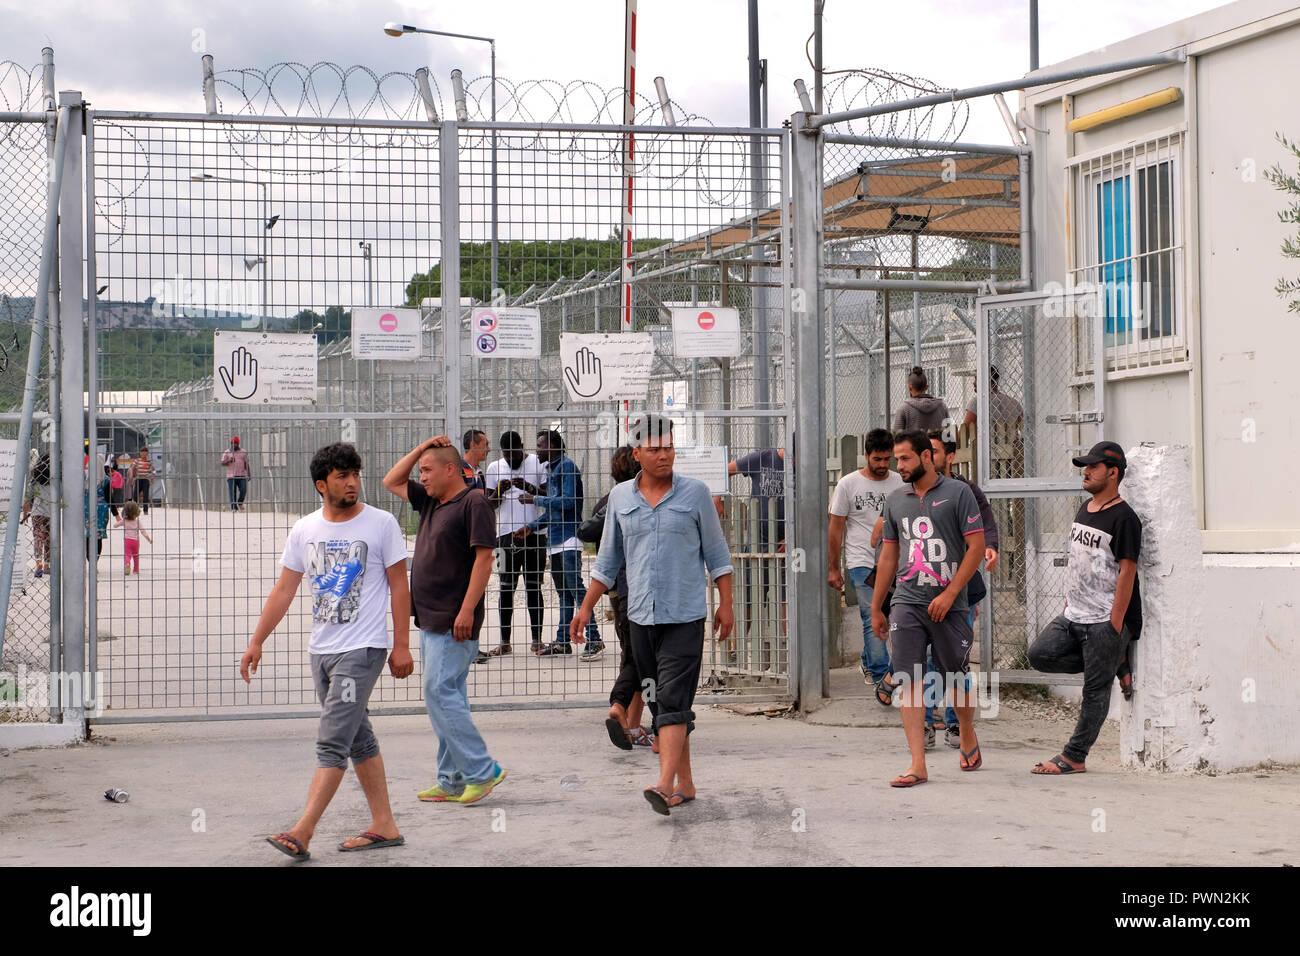 MORIA CAMP for refugees who came by boat from nearby Turkey to the iIsland of Lesbos, Greece, May 2018 - MORIA CAMP für Flüchtlinge, die mit einem Boot vom der nahen Türkei herübergekommen sind. Insel Lesbos, Griechenland, Mai 2018 - Stock Image